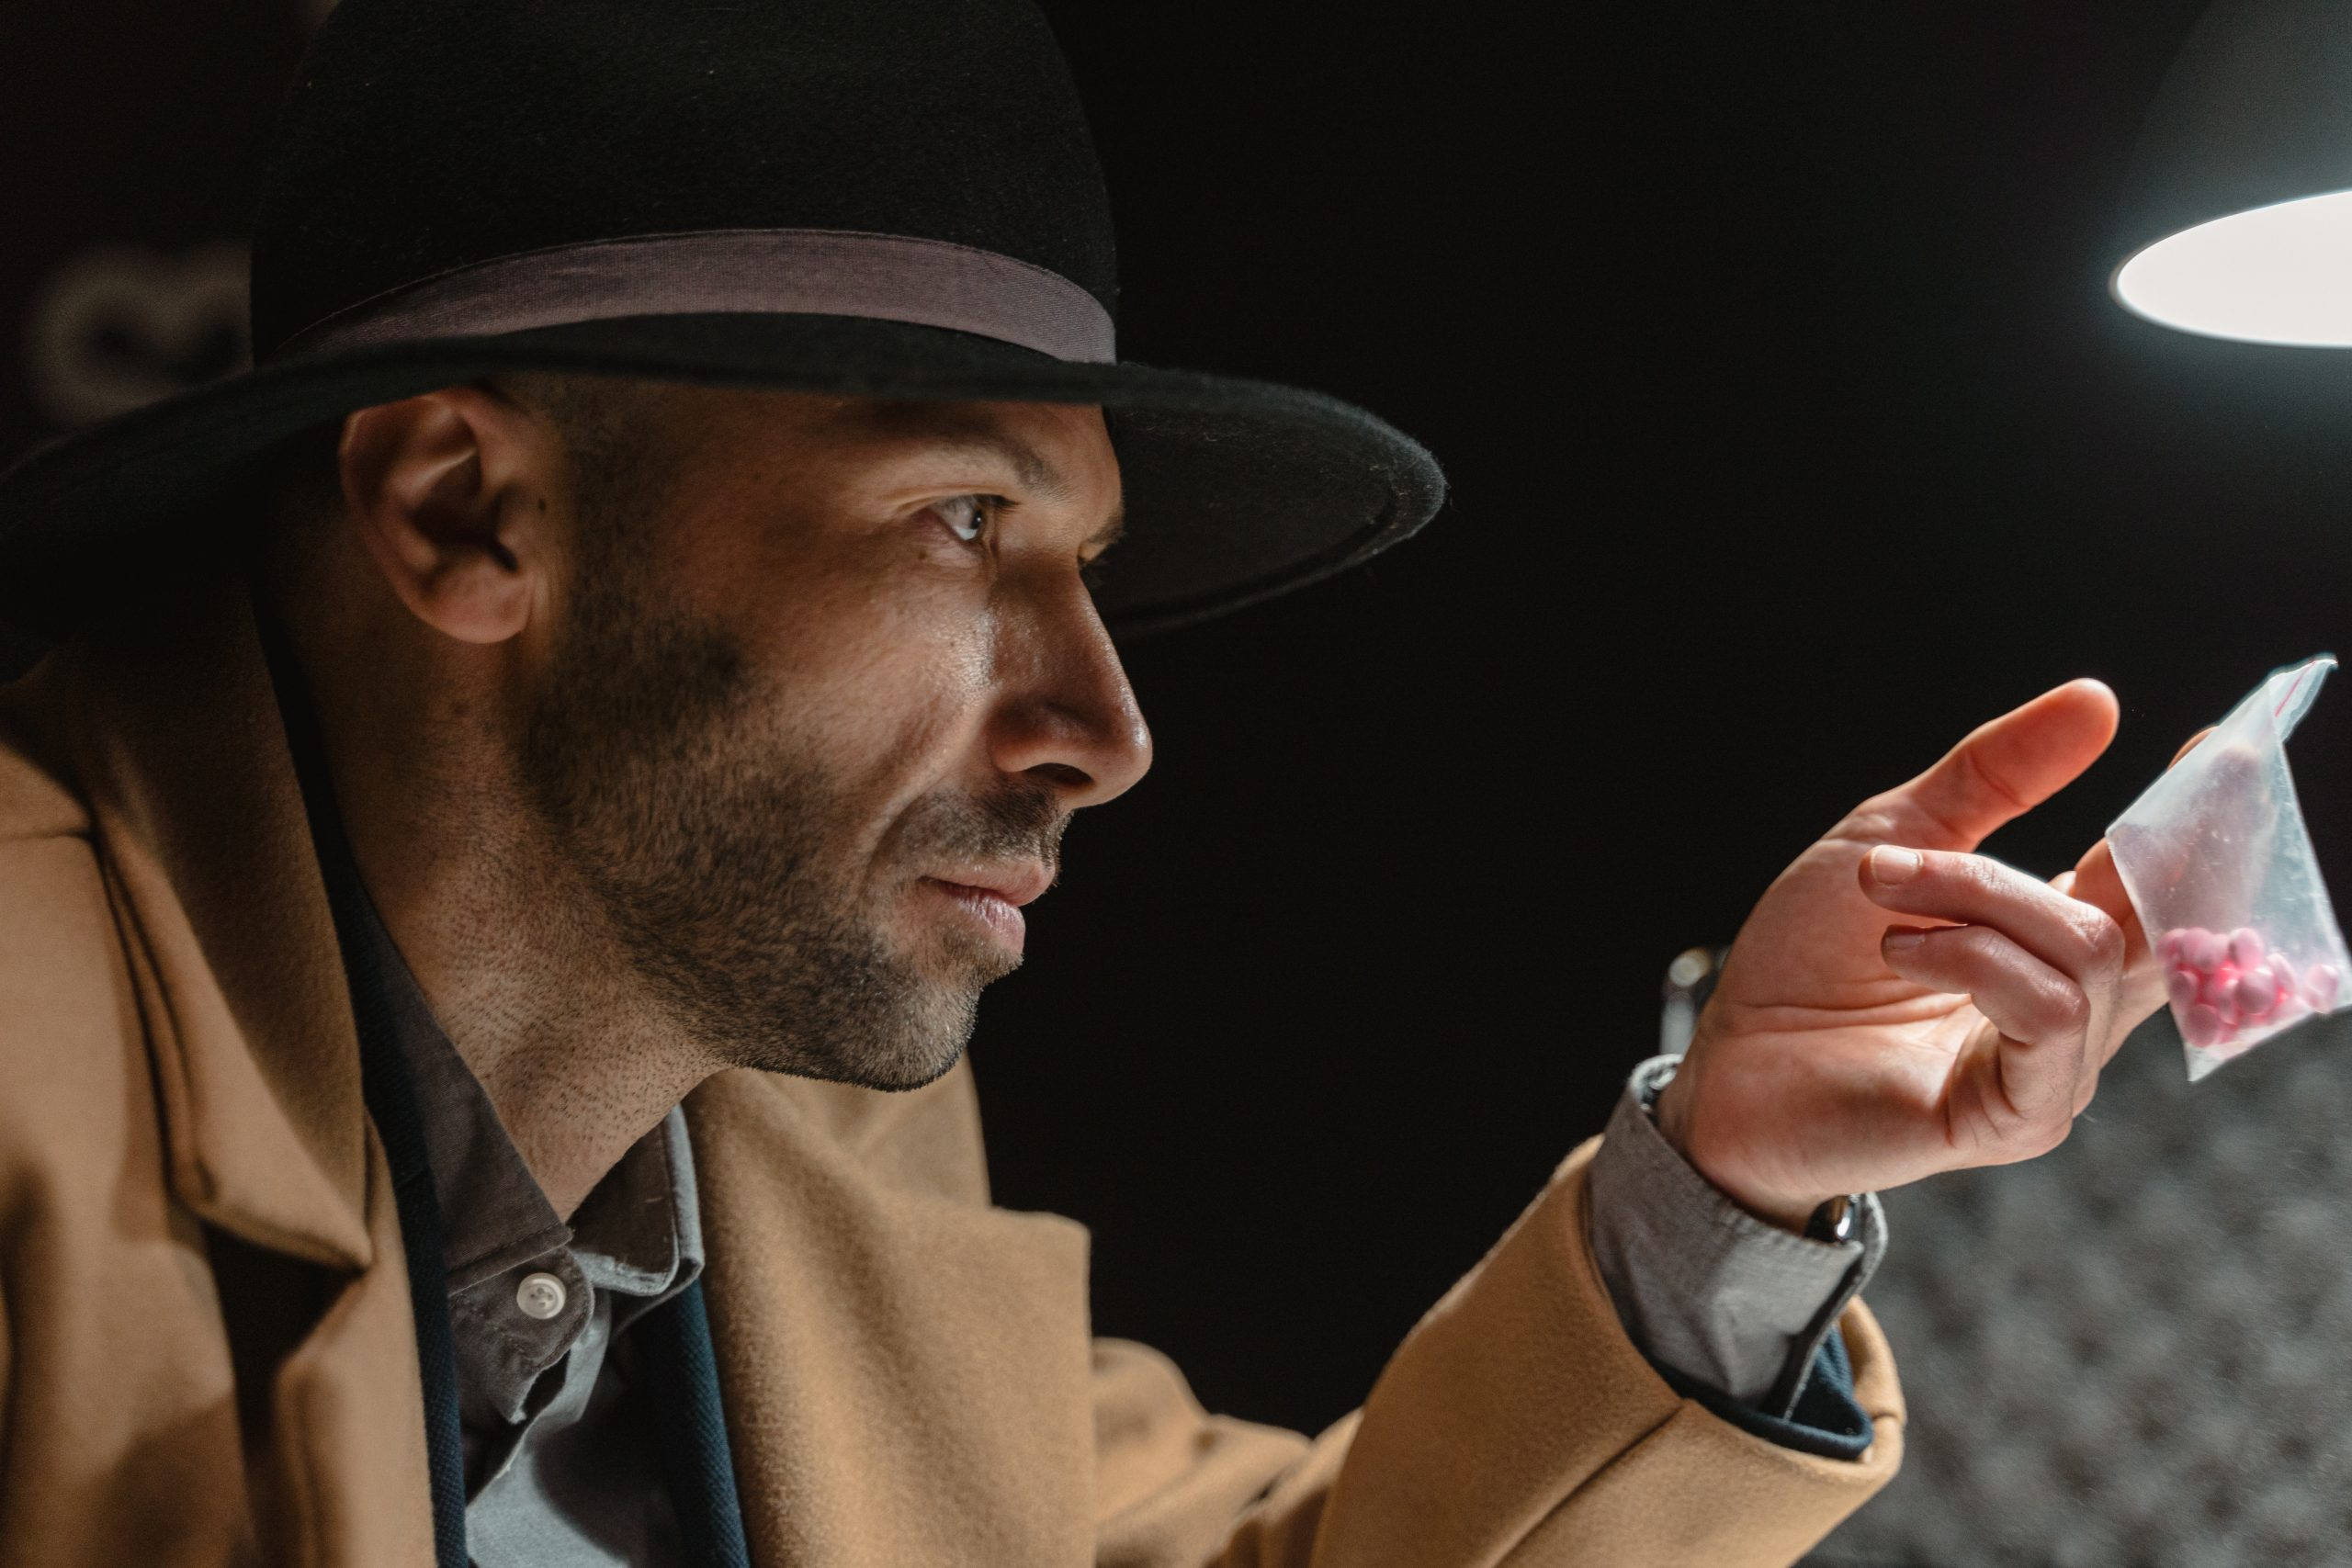 Man in brown coat and black hat